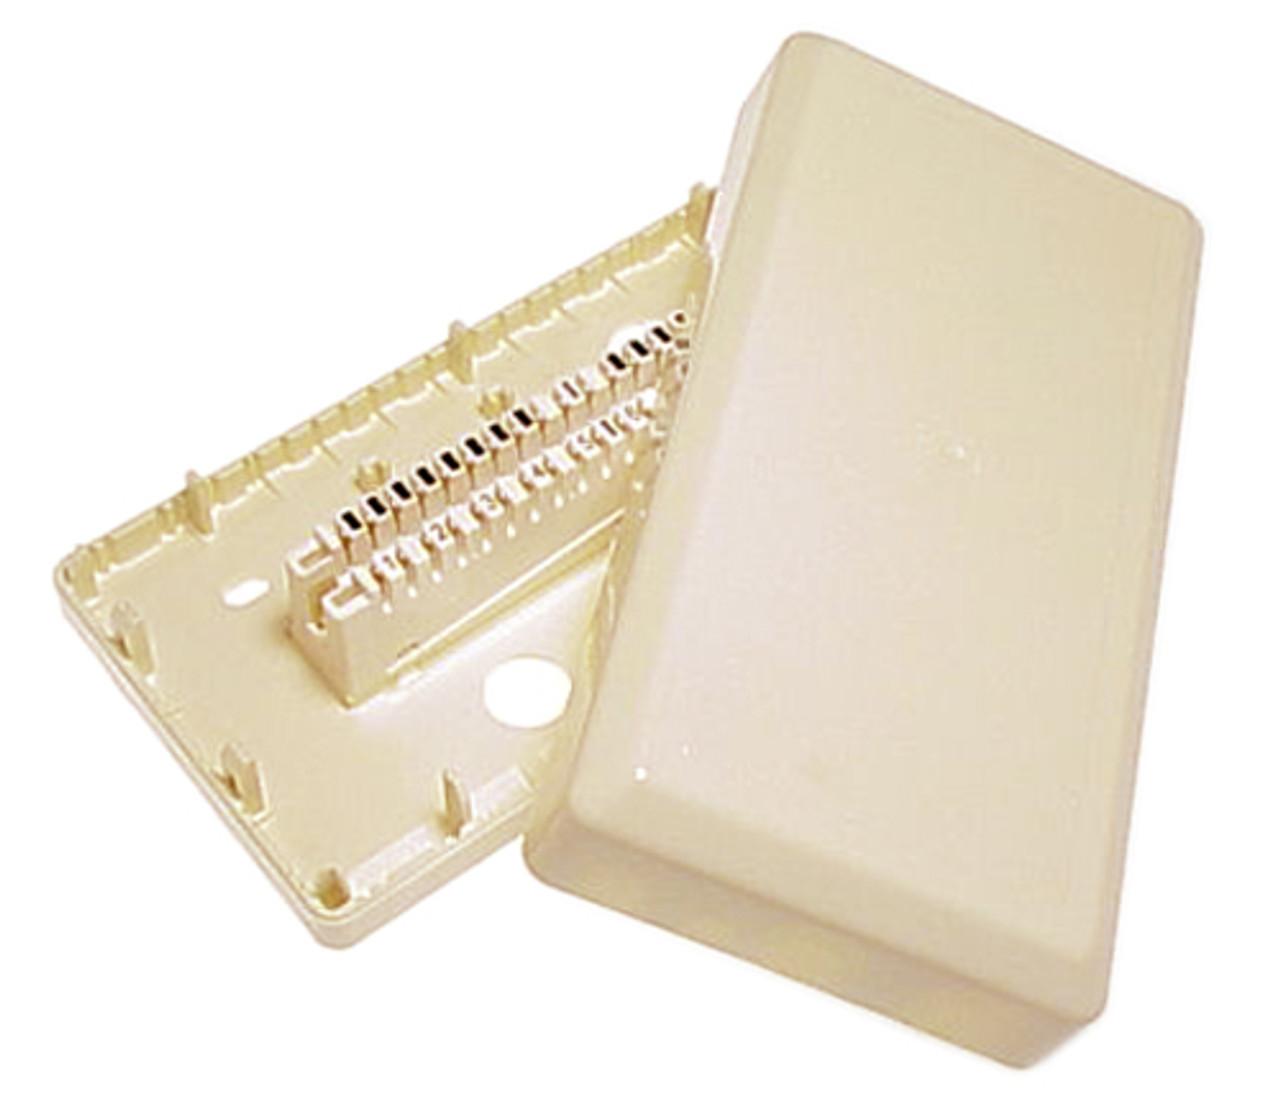 10Pr Idf Box Disconnect Module - P8740 - Access Communications Idf Rack Wiring Diagram on